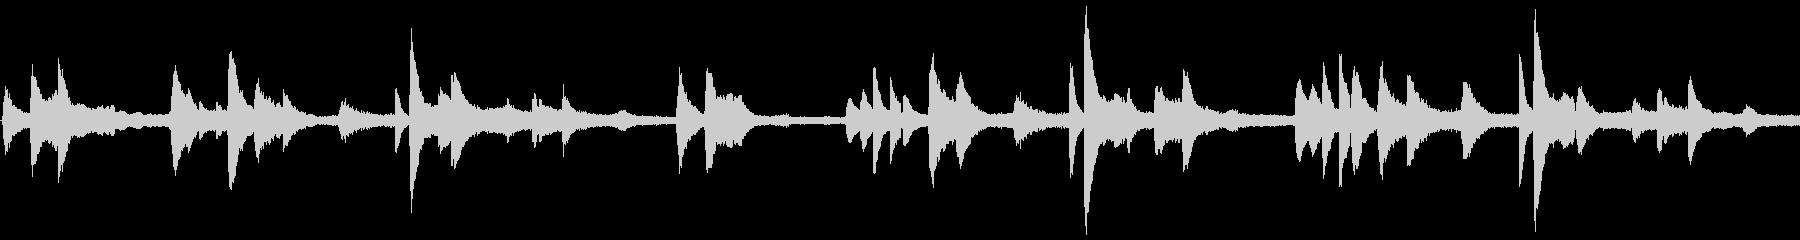 Lo-fi Piano Beatsの未再生の波形